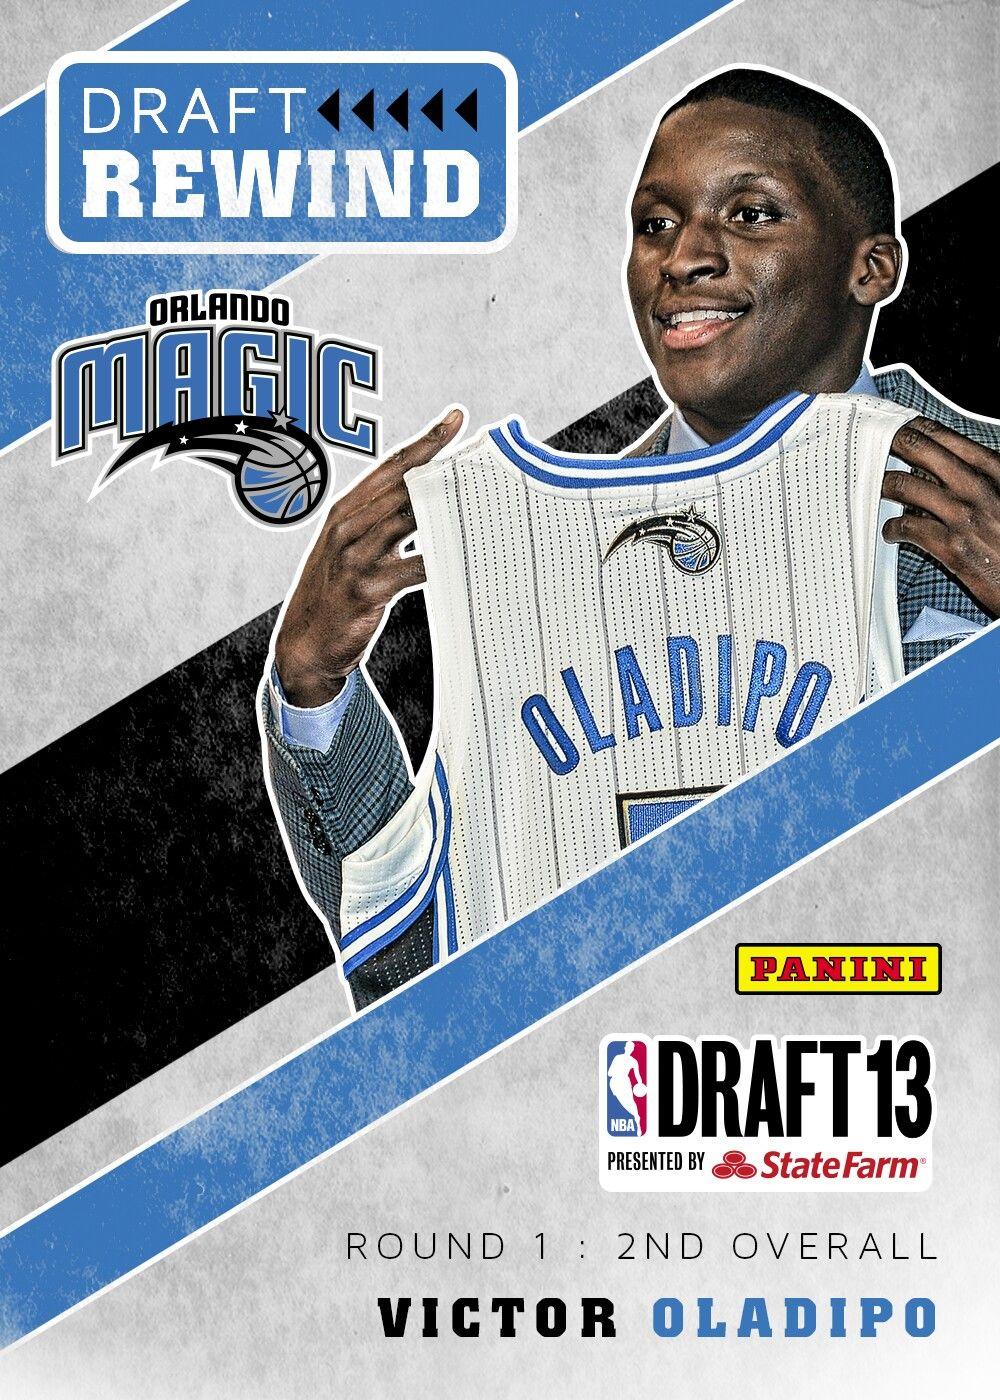 Victor Oladipo - NBA Drarew Sticker